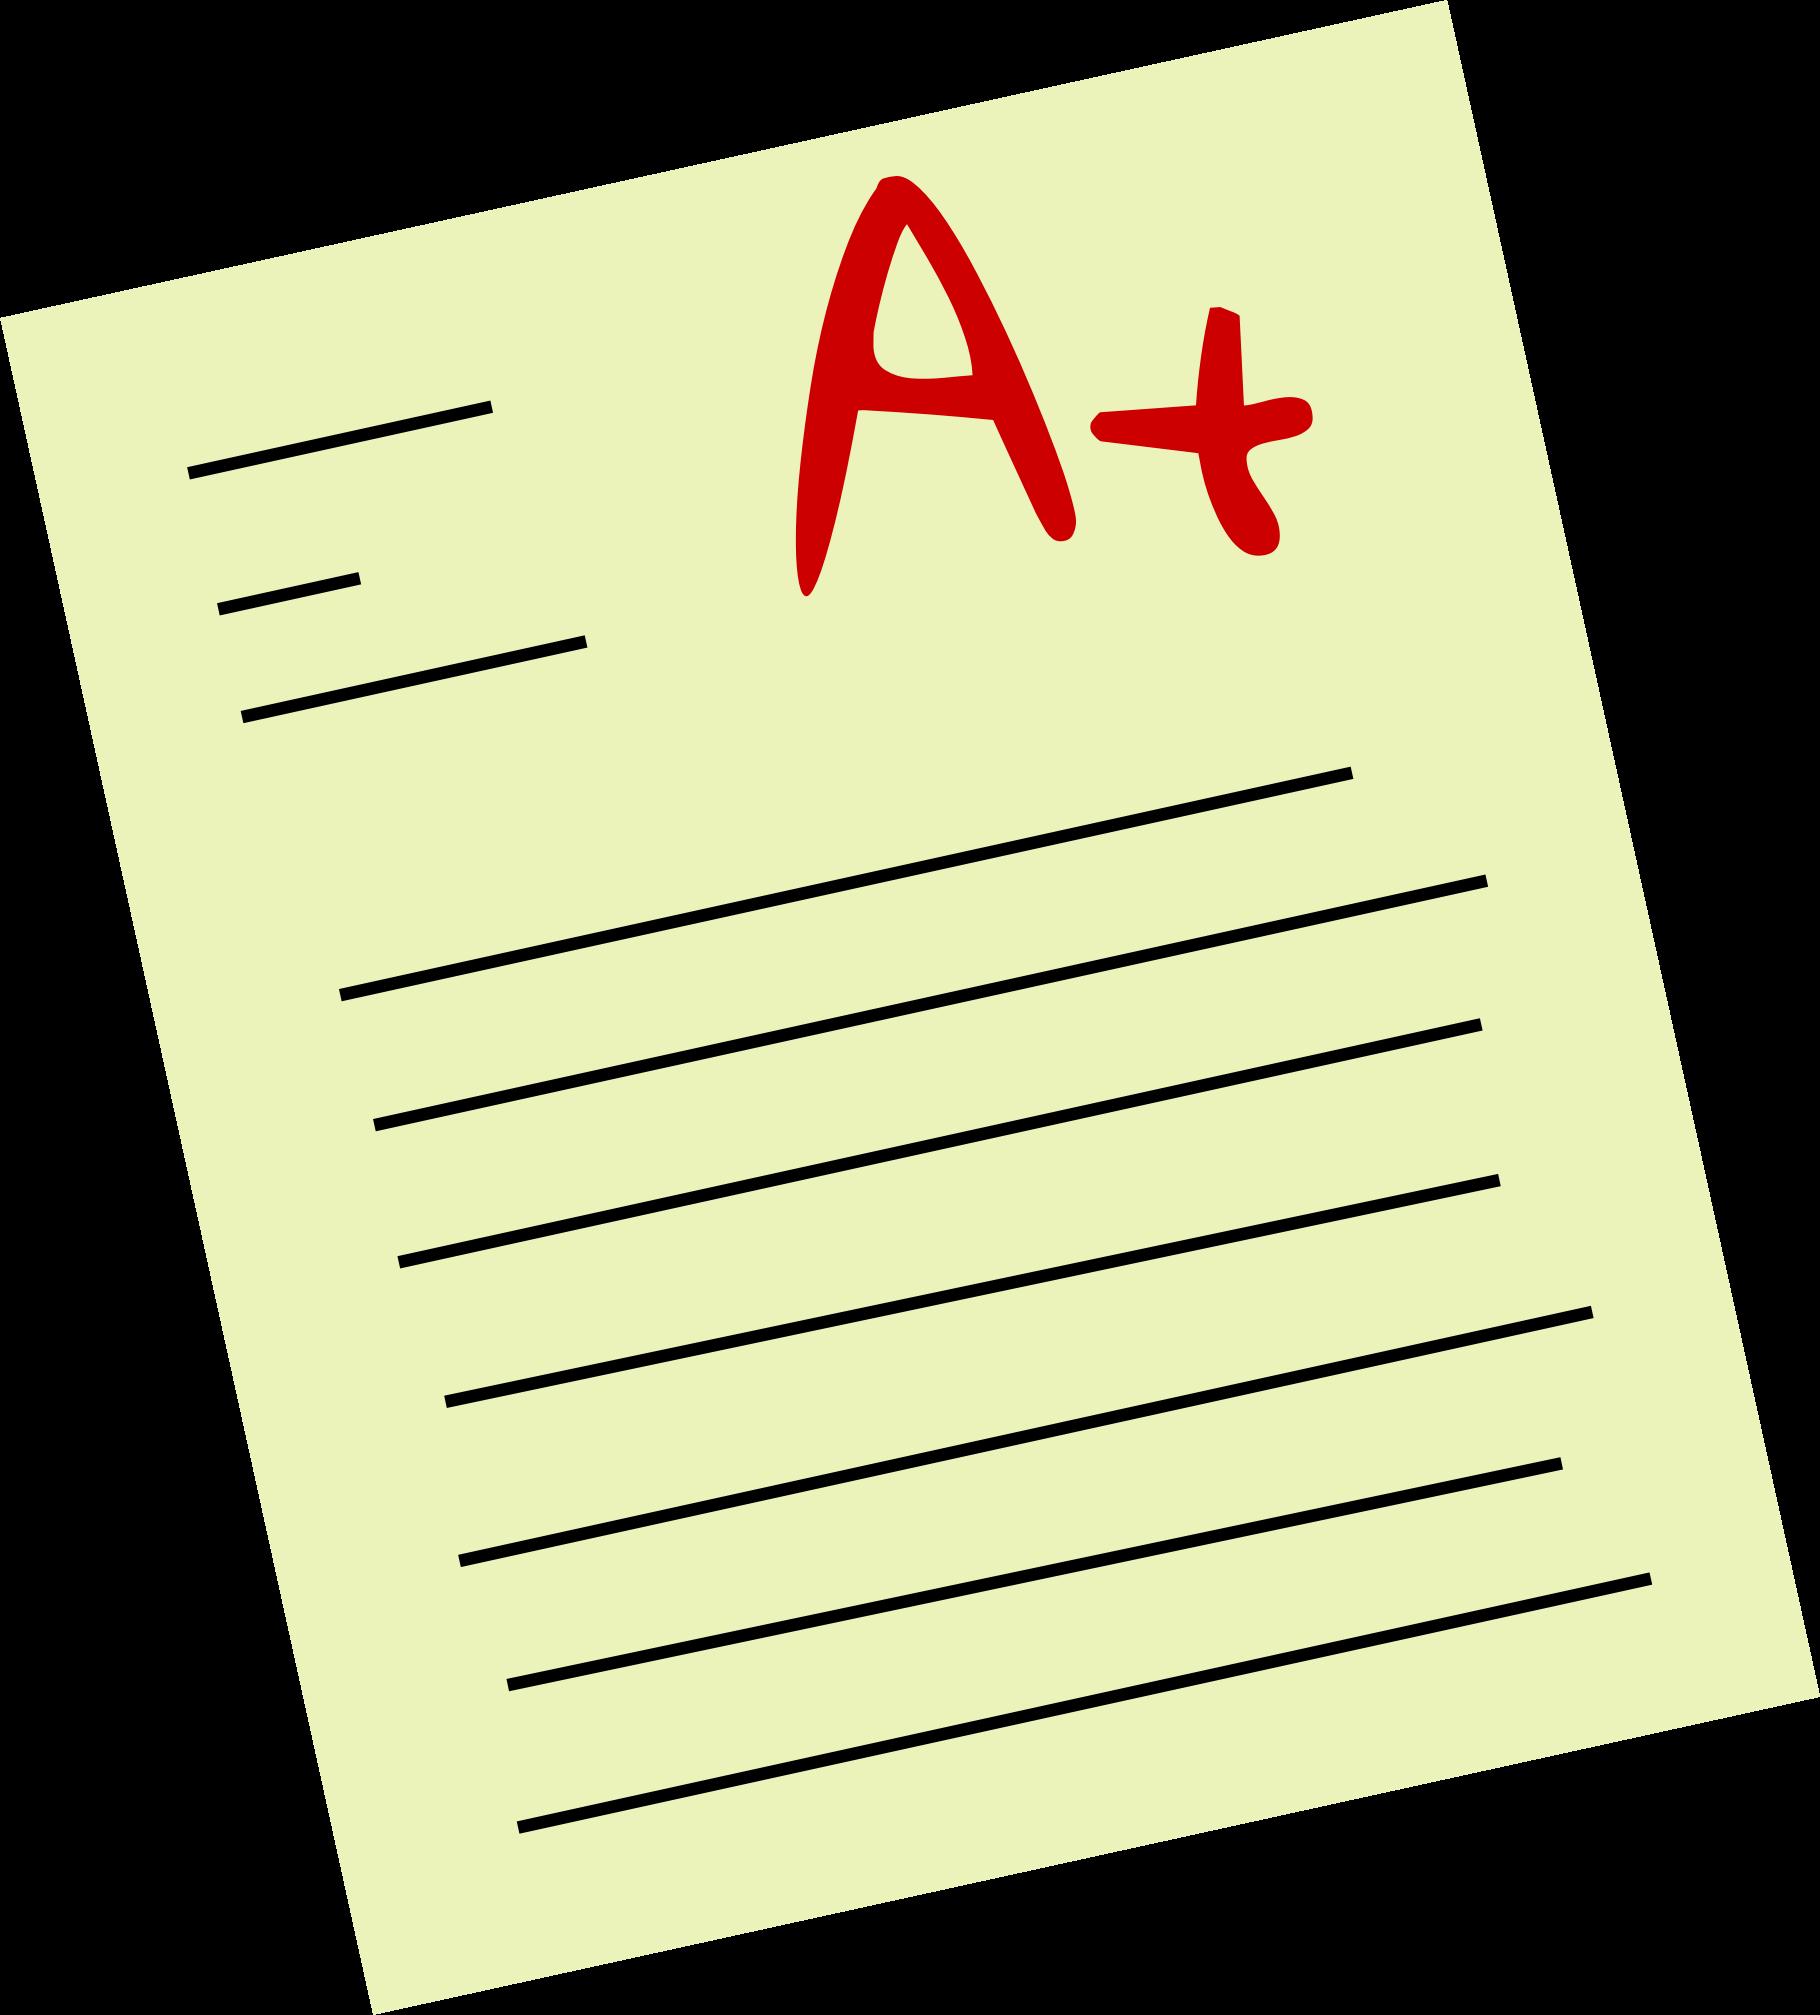 freeuse library Free cliparts download clip. Grades clipart school grade